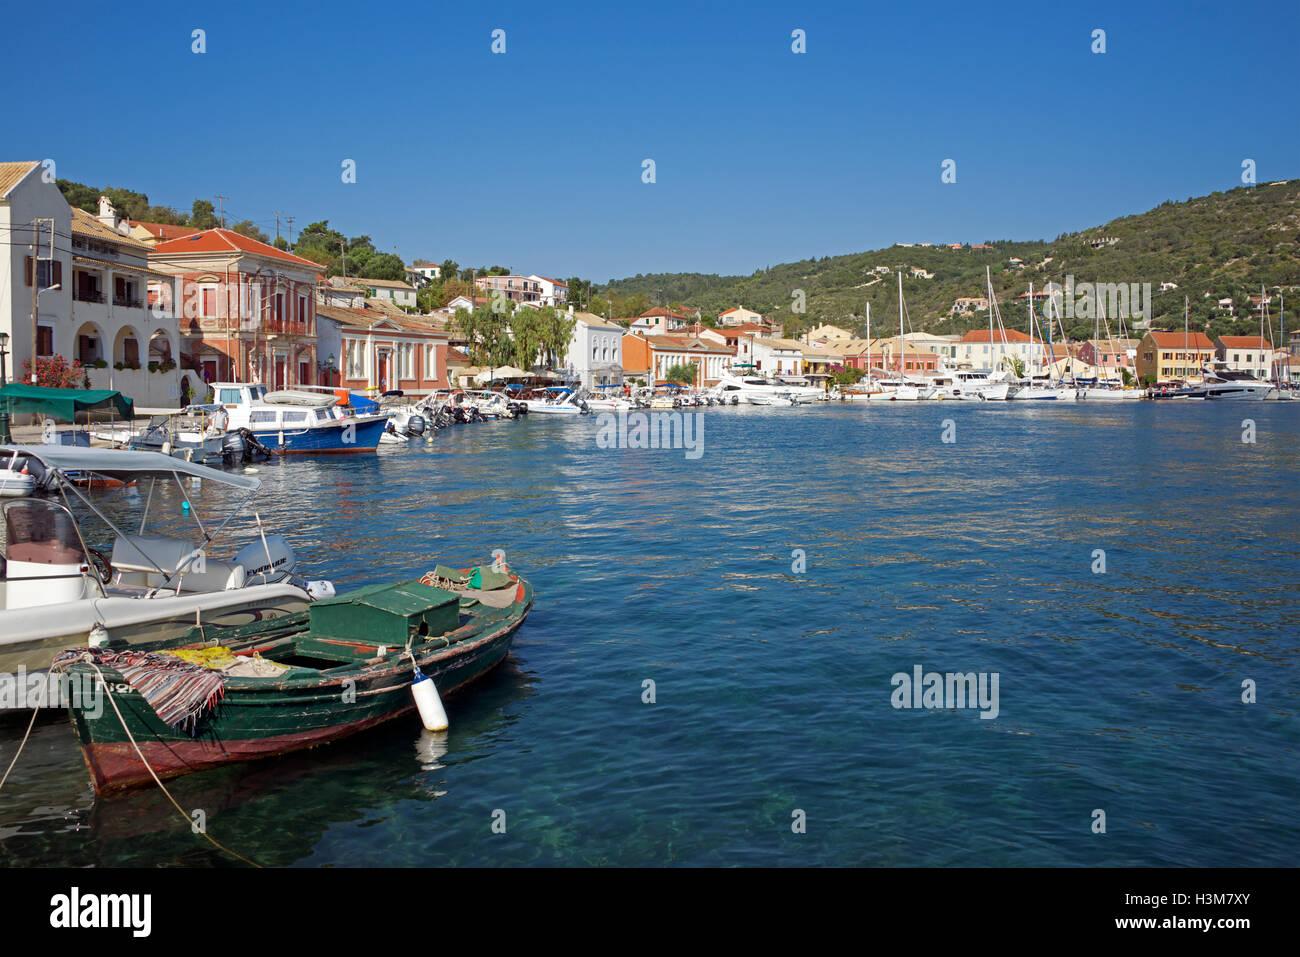 Panoramic view Gaios Harbour Paxos Ionian Islands Greece - Stock Image